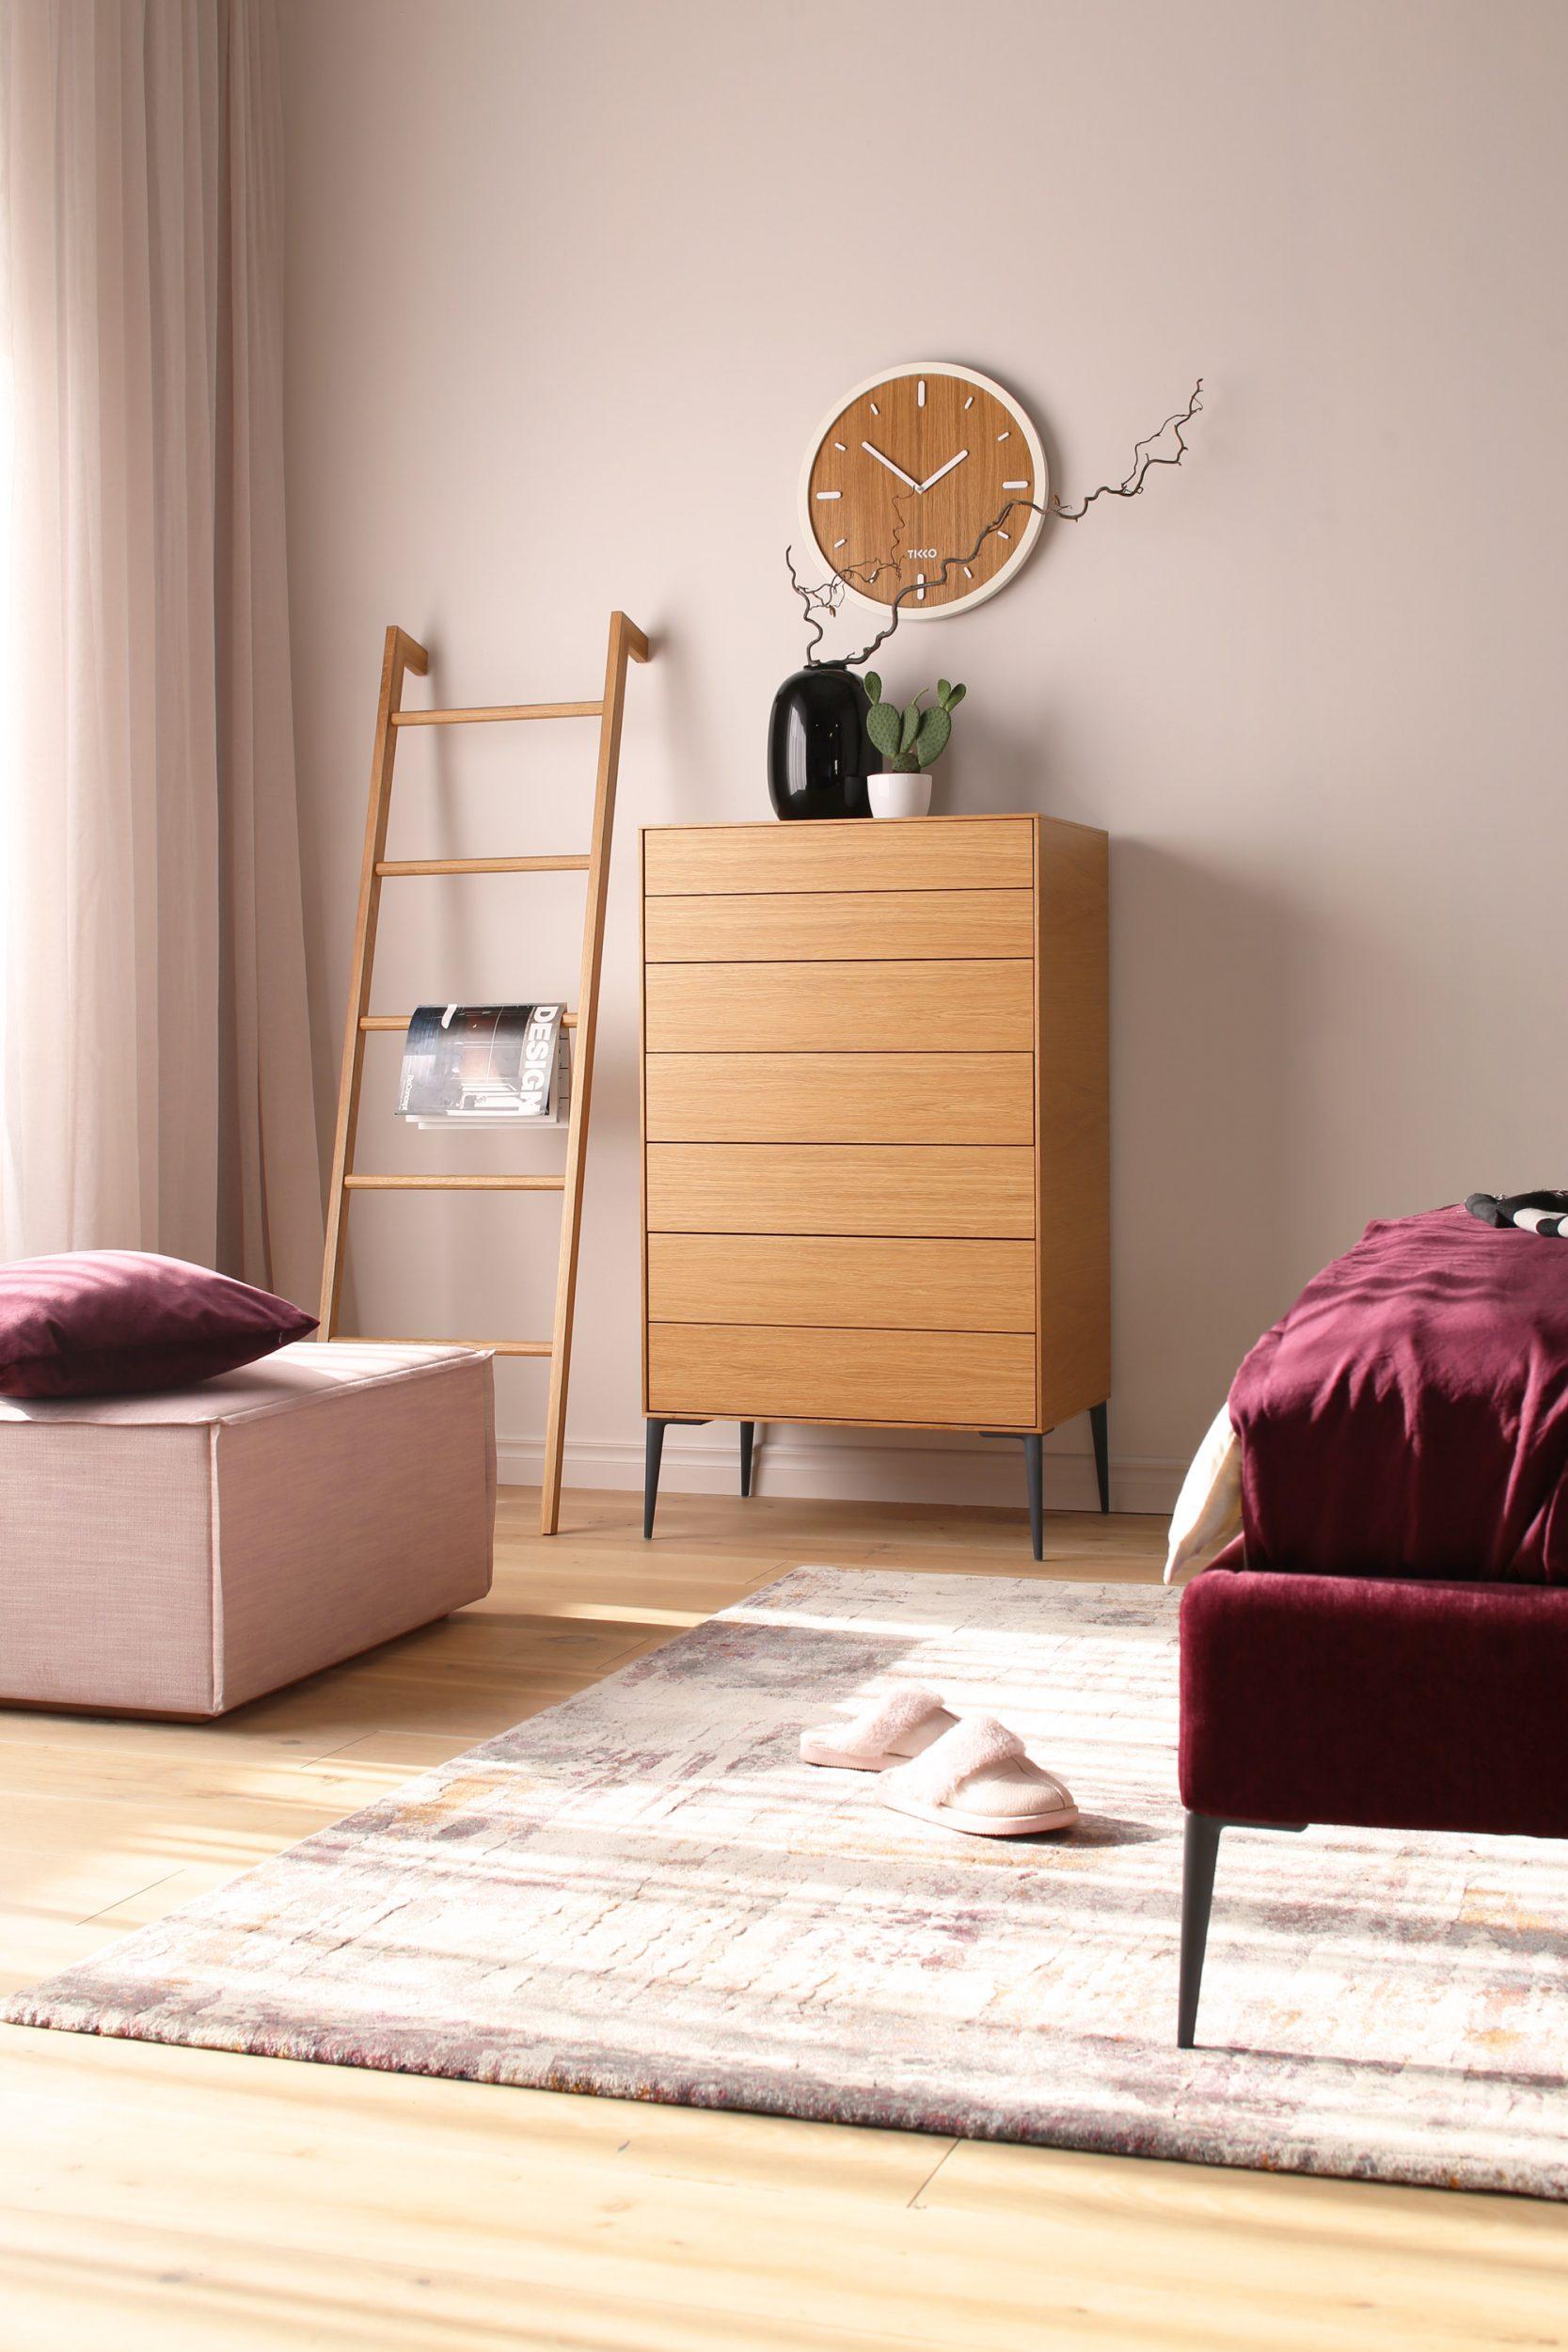 guļamistabas kolekcijas sofija ozolkoka kumode